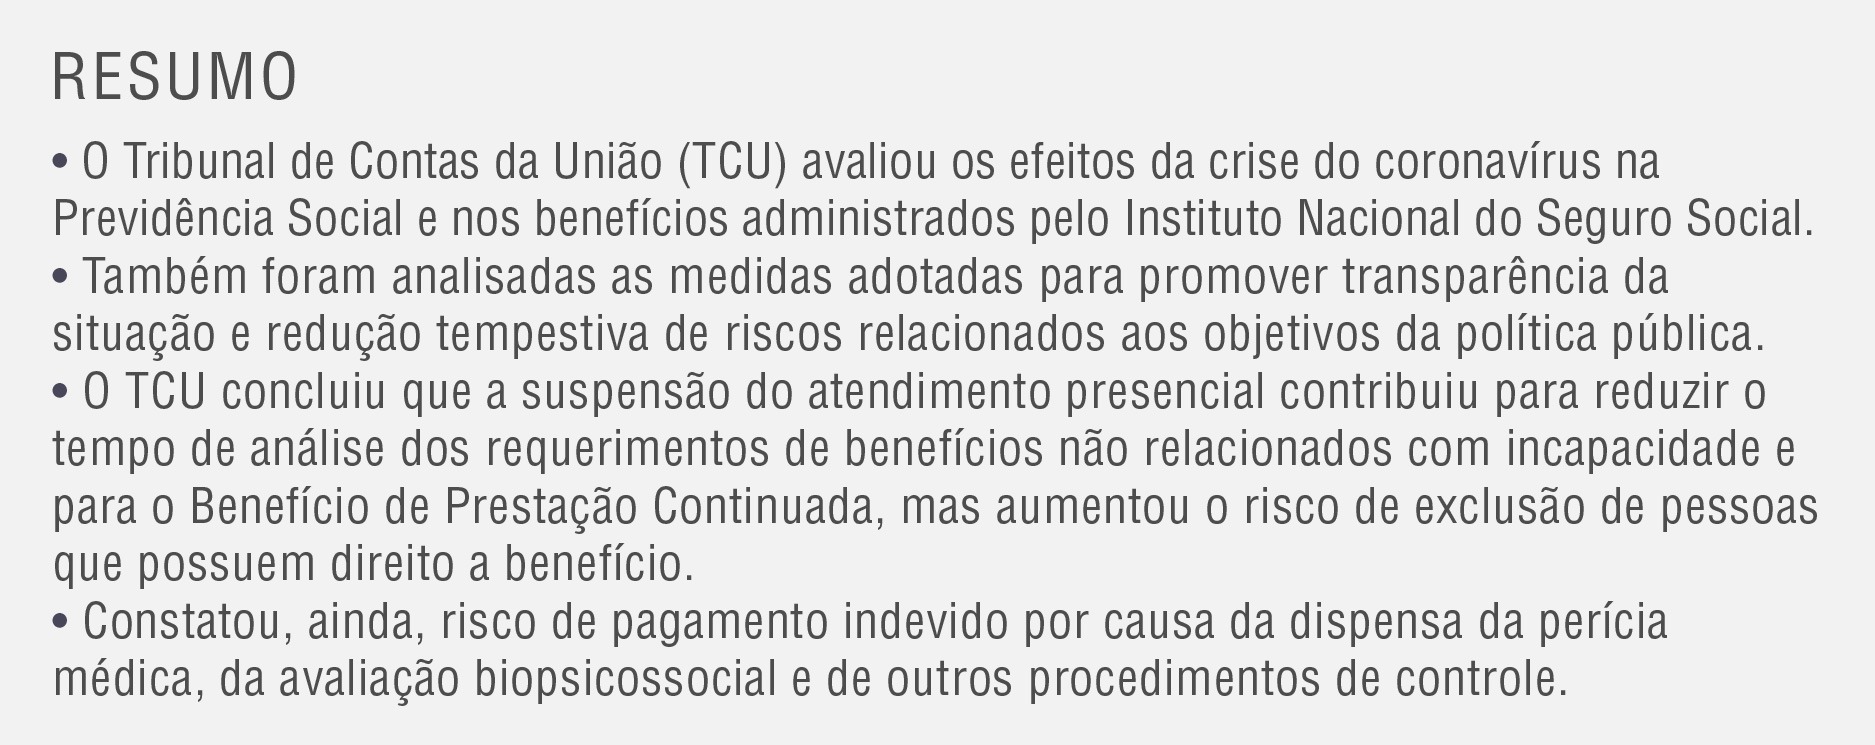 Quadro_resumo_padrao_secexprevi-01.jpg